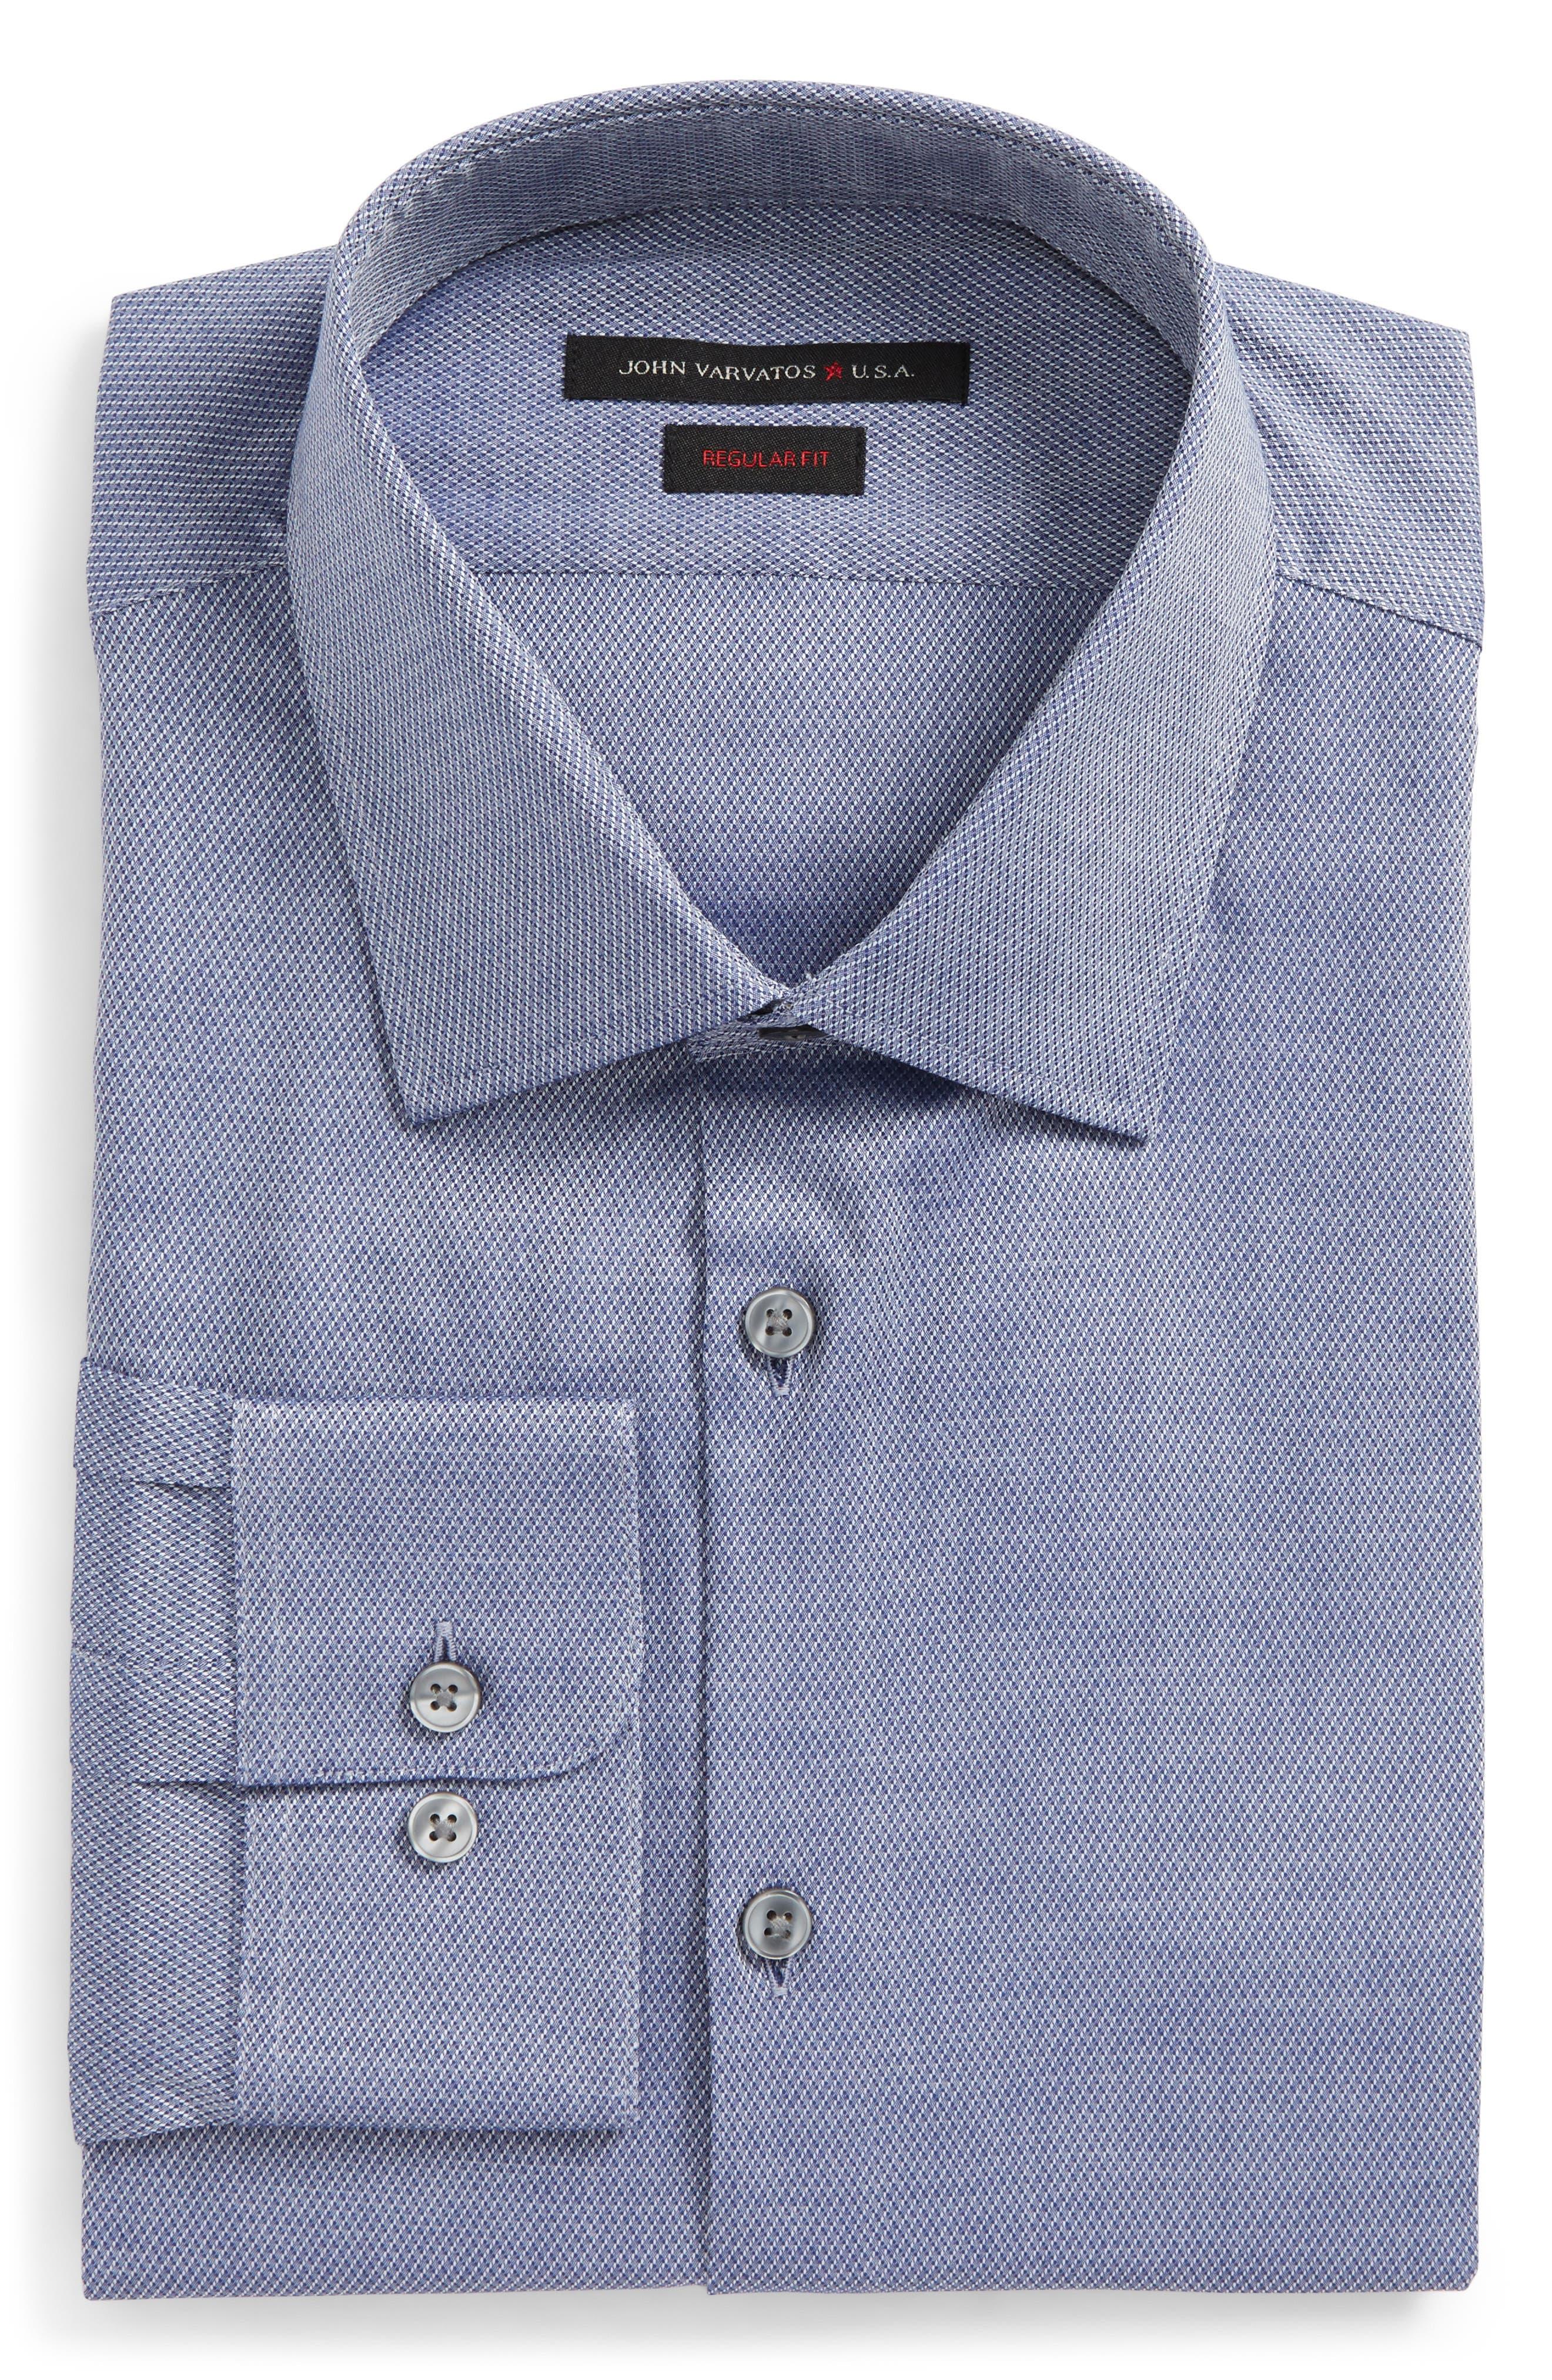 Regular Fit Dress Shirt,                             Main thumbnail 1, color,                             439